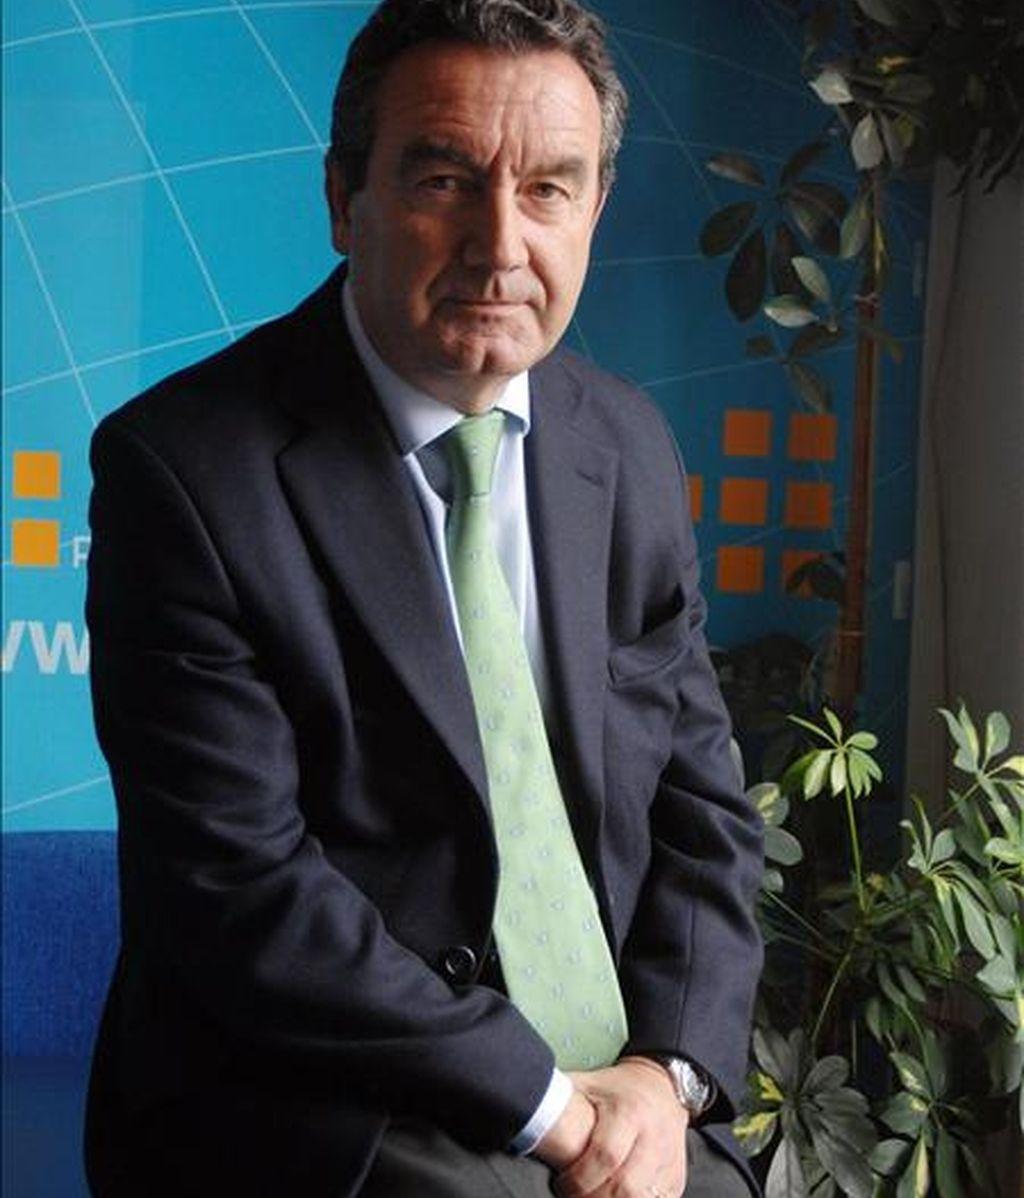 El diputado popular Jesús Merino. EFE/Archivo